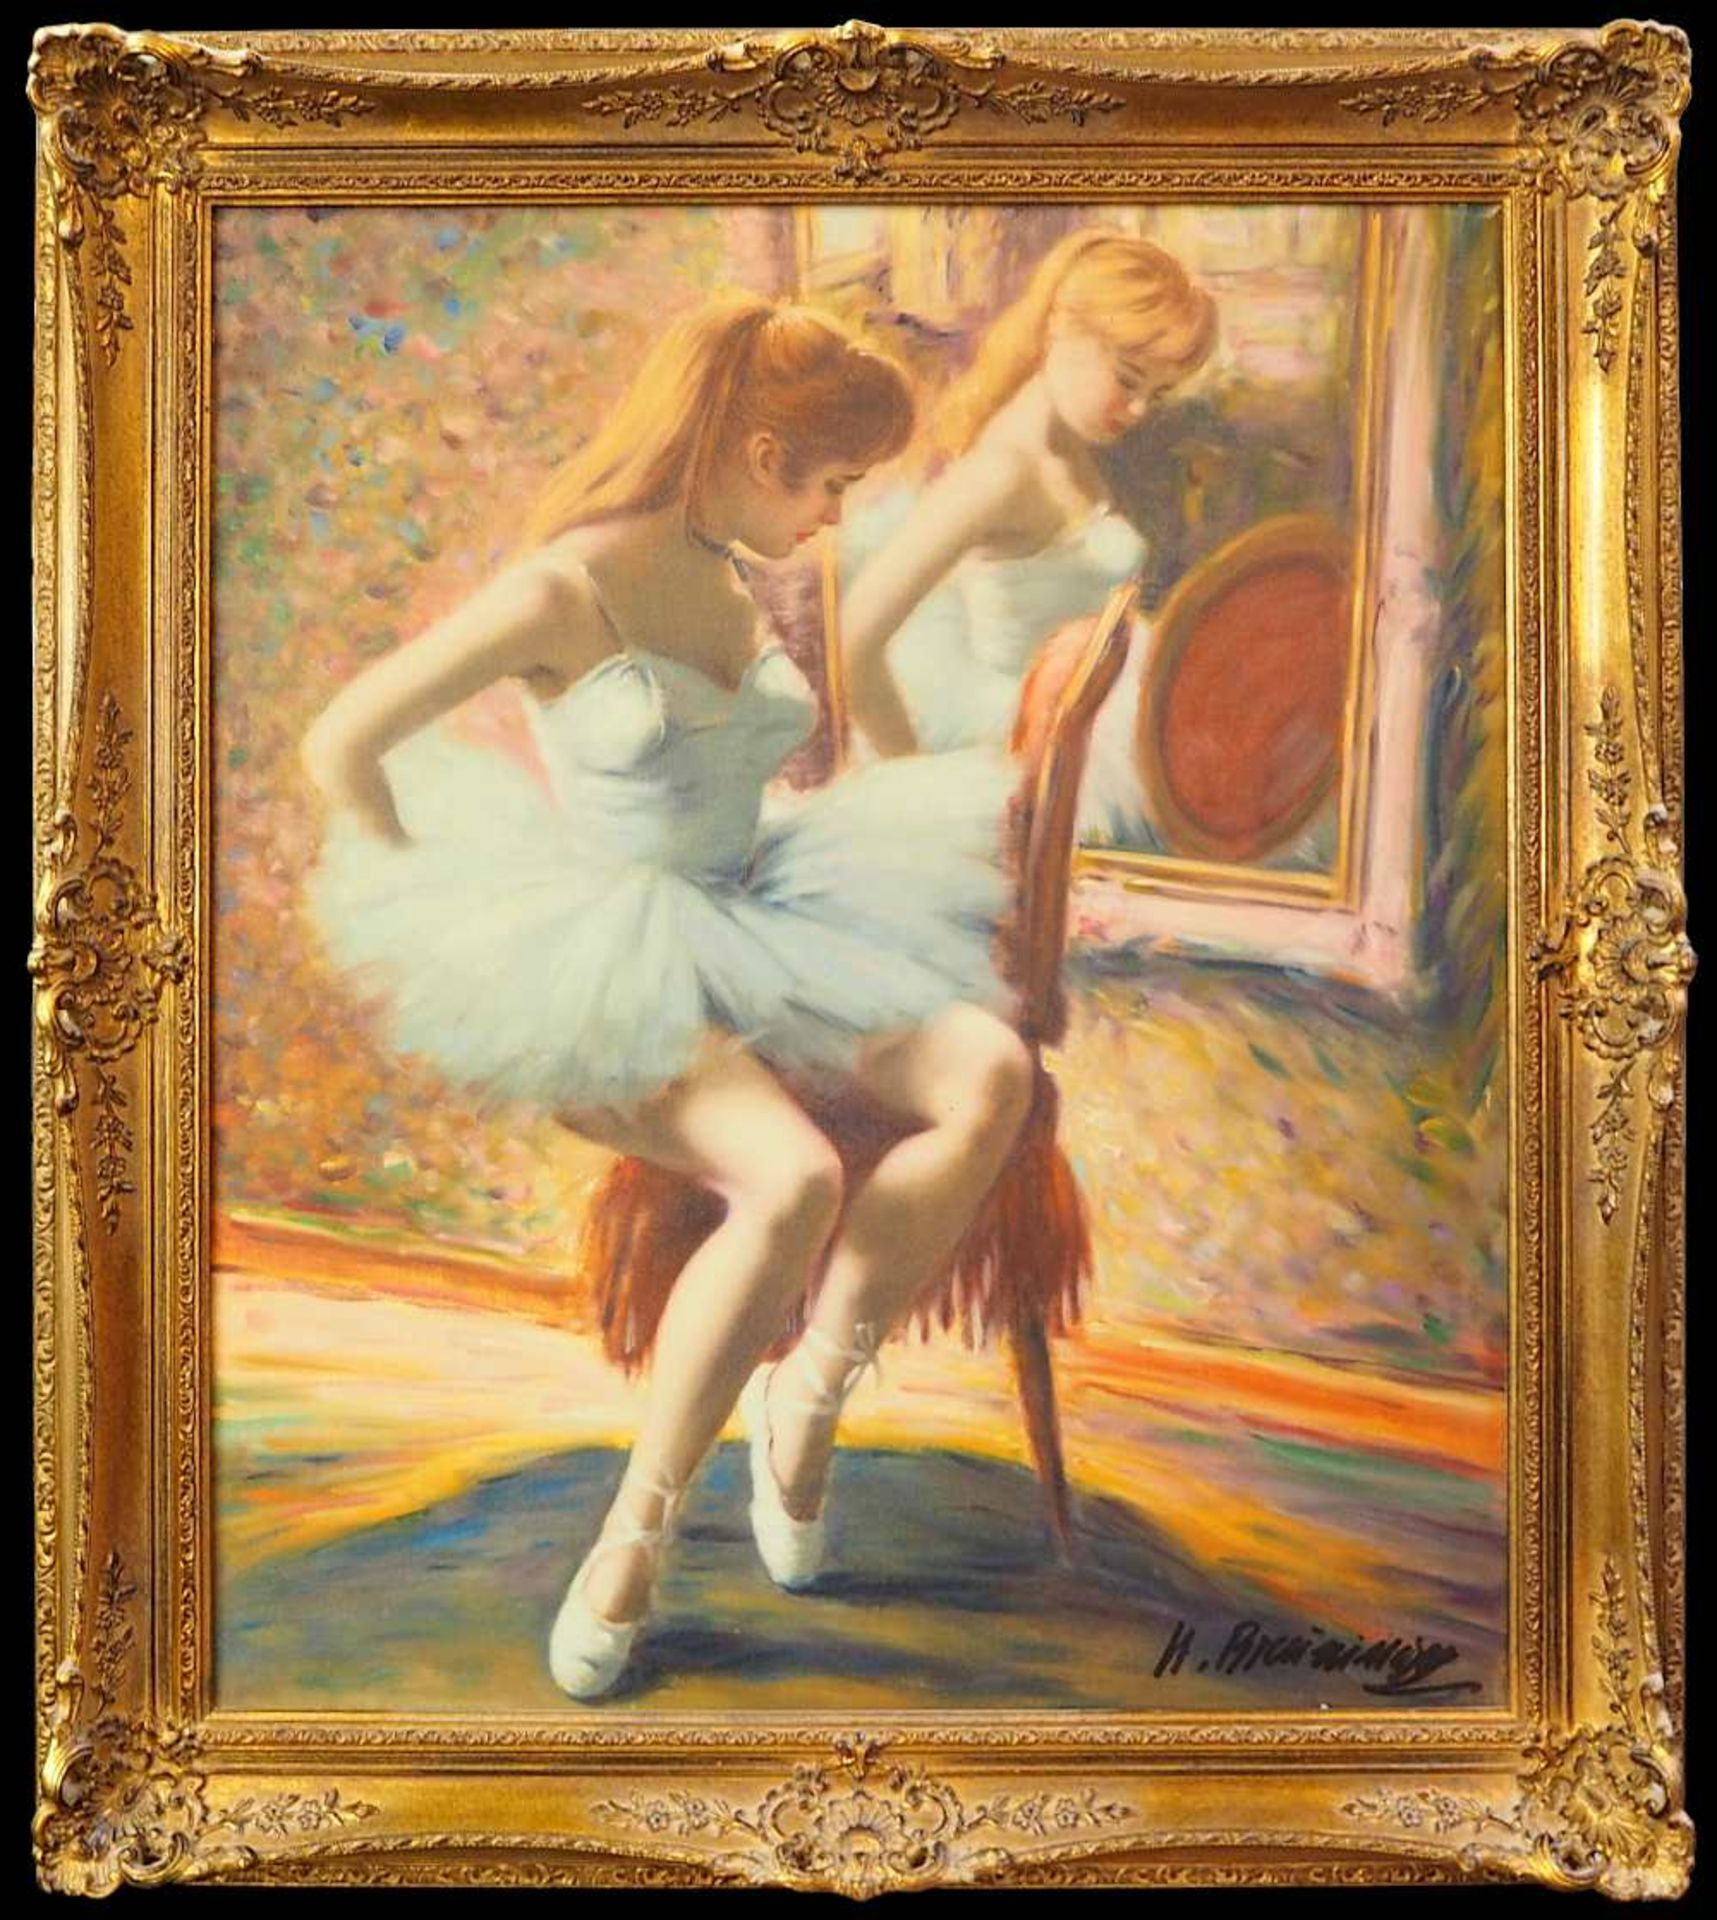 "1 Ölgemälde ""Ballerina im Spiegel"" R.u. sign. H. BREUNINGER (wohl Helmut B. *1921) Öl/Lwd., ca. - Bild 3 aus 4"